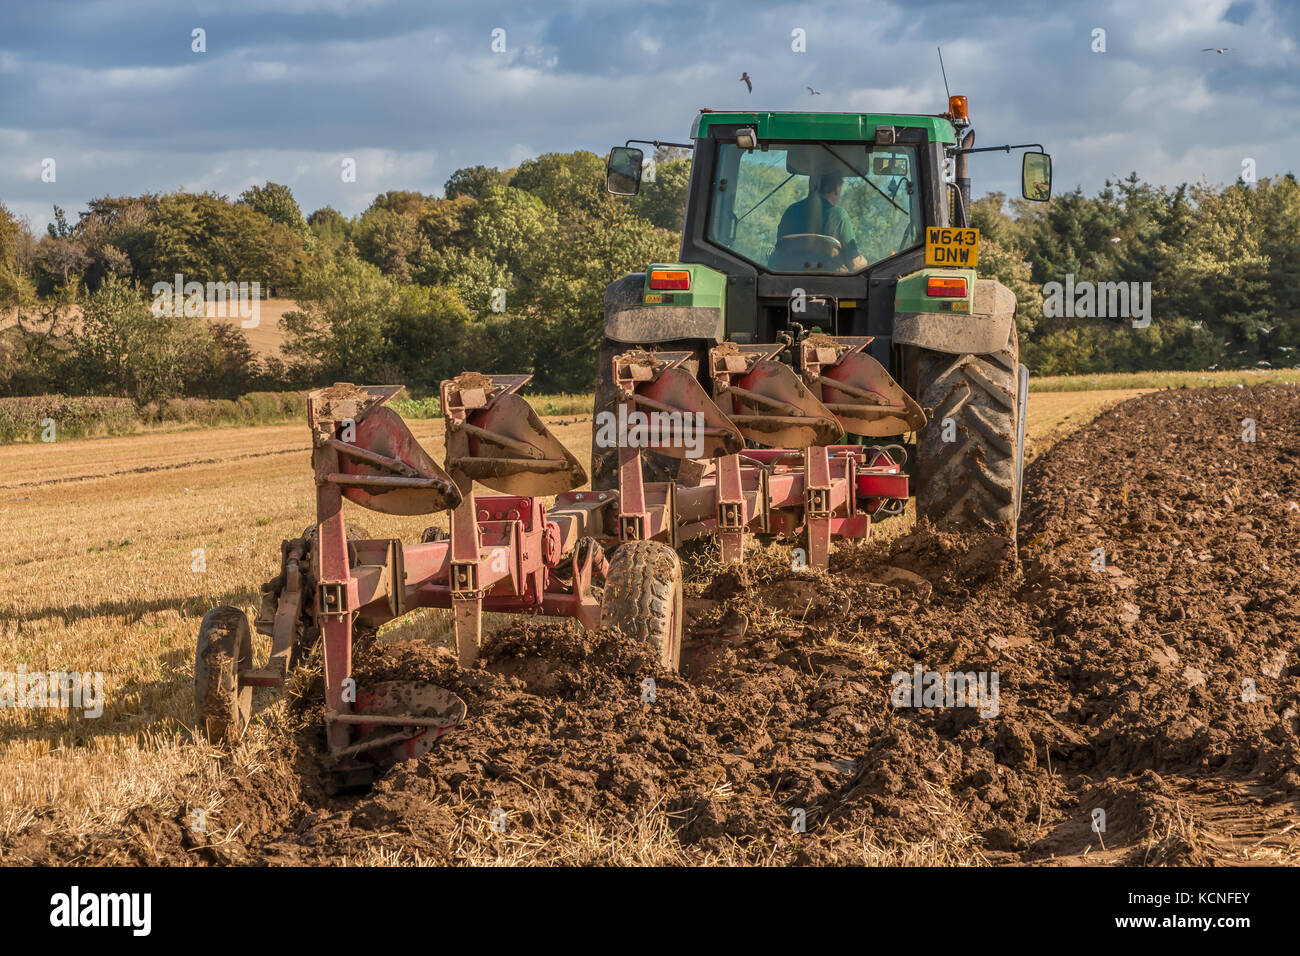 Uk Farming A John Deere Tractor And Naud Ap Wagon Plough Kcnfey